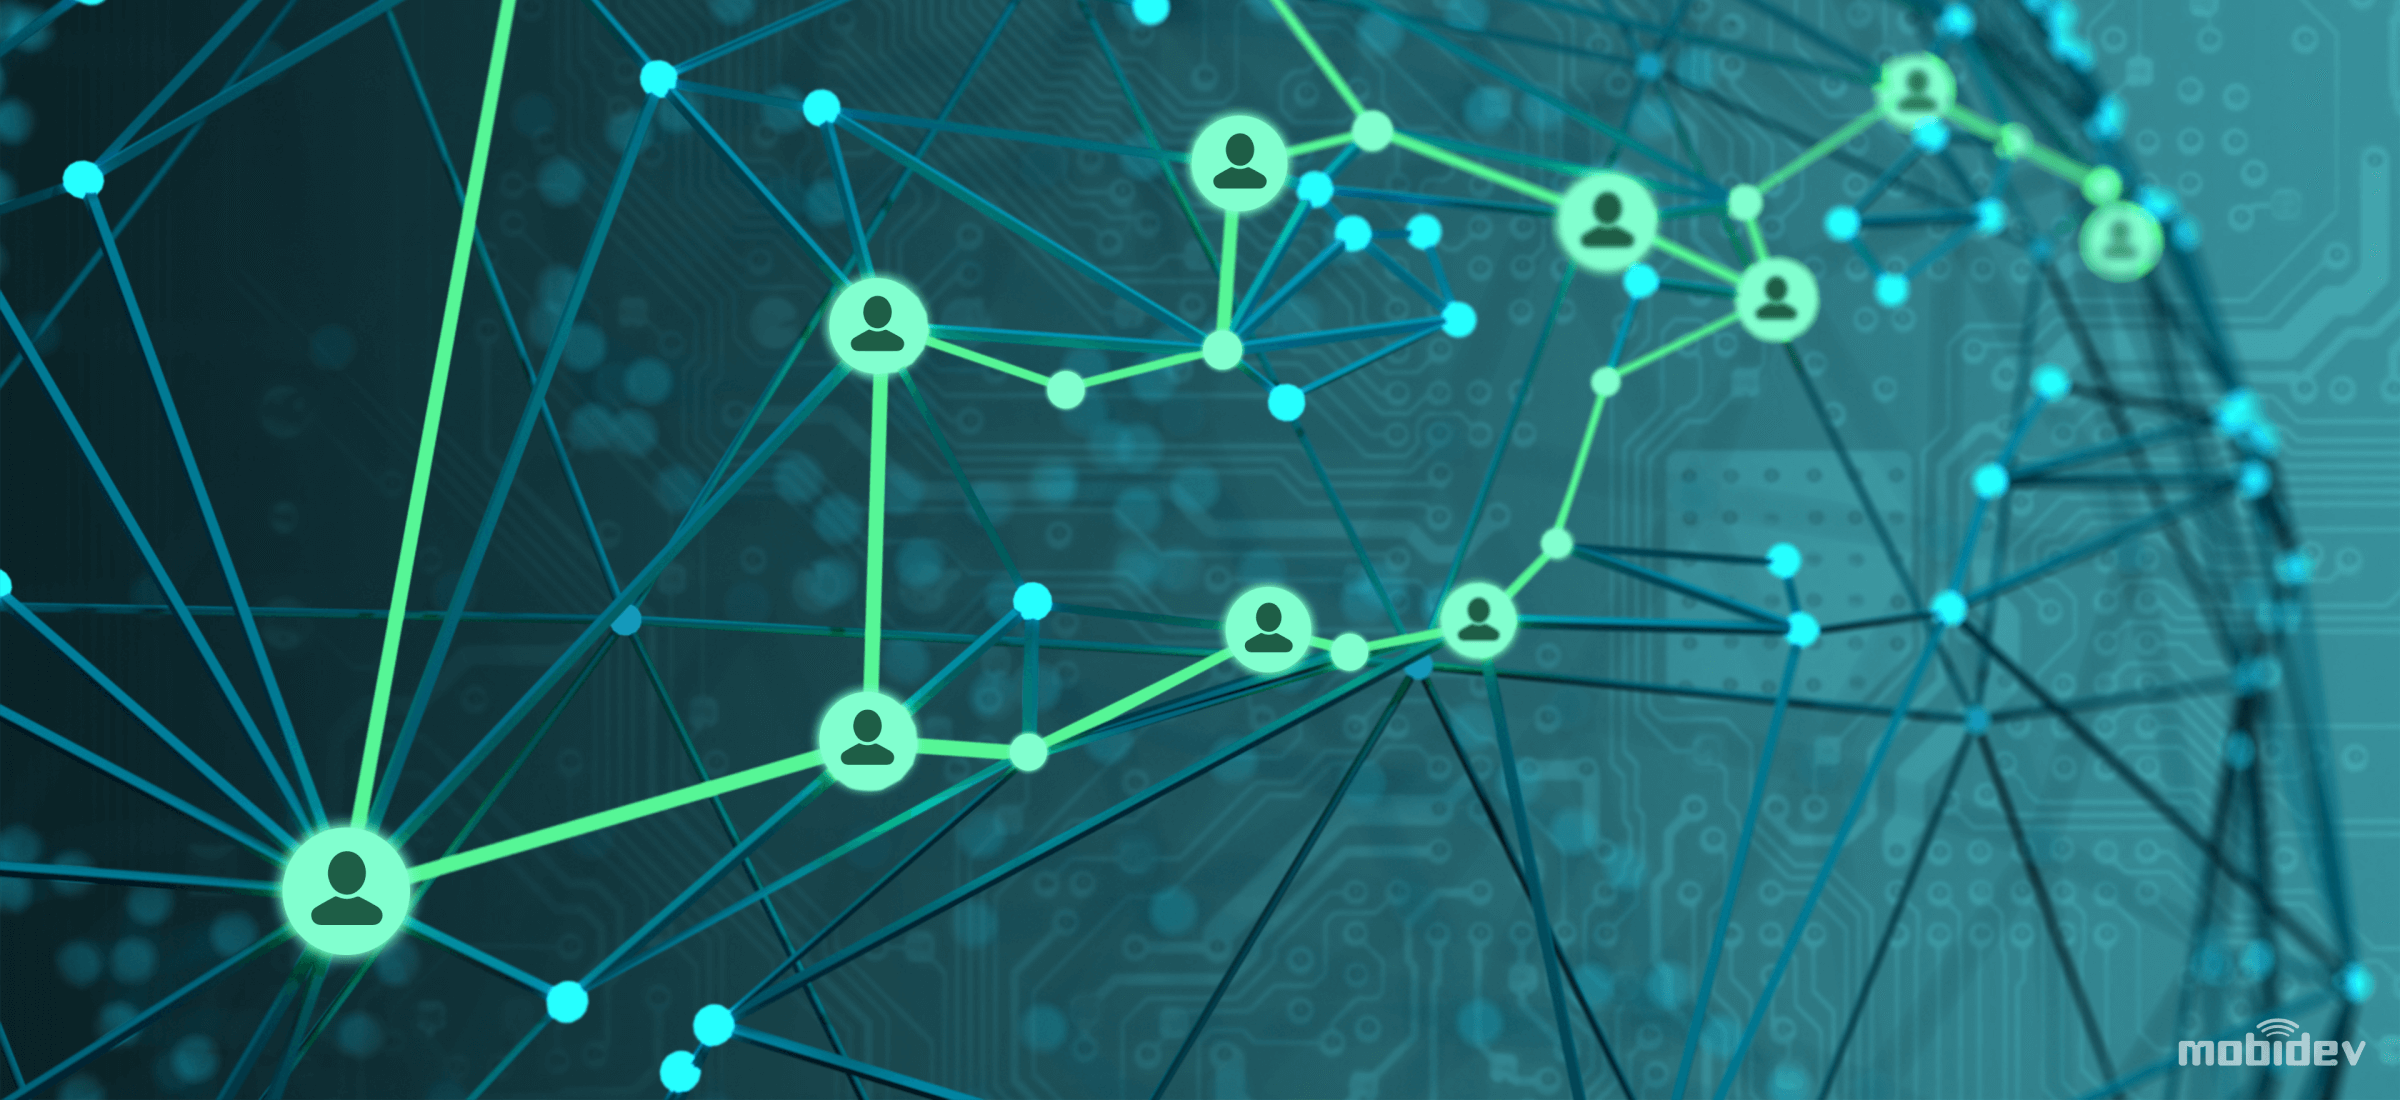 Blockchain Demo: Digital Media Transactions And Content Distribution